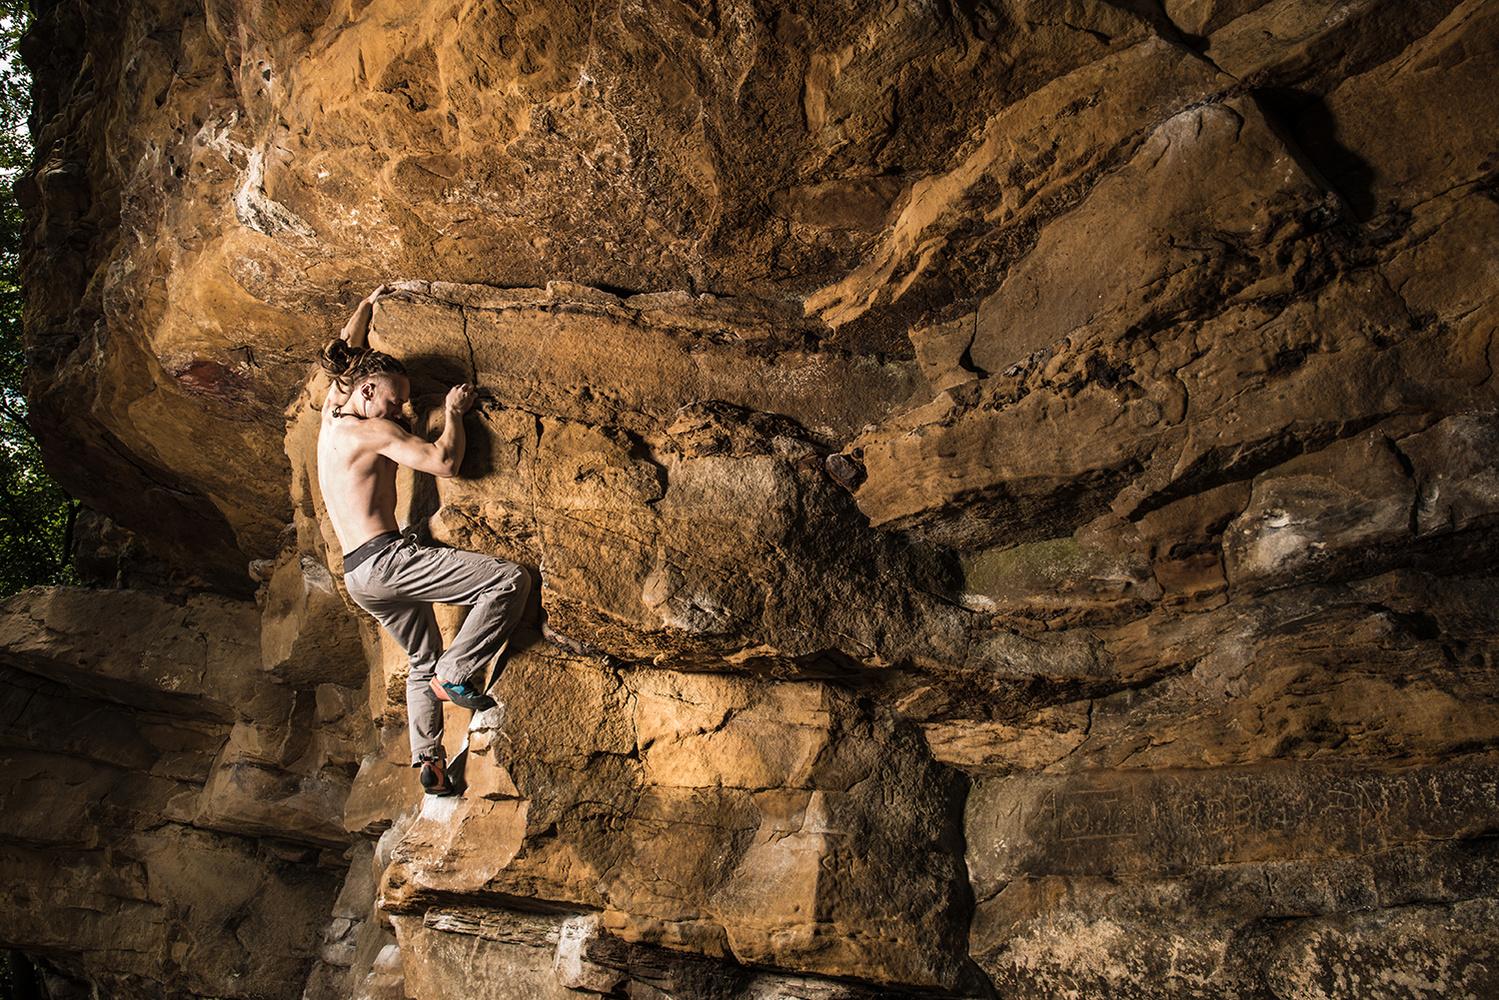 Scaling the ledge by Seth Thompson